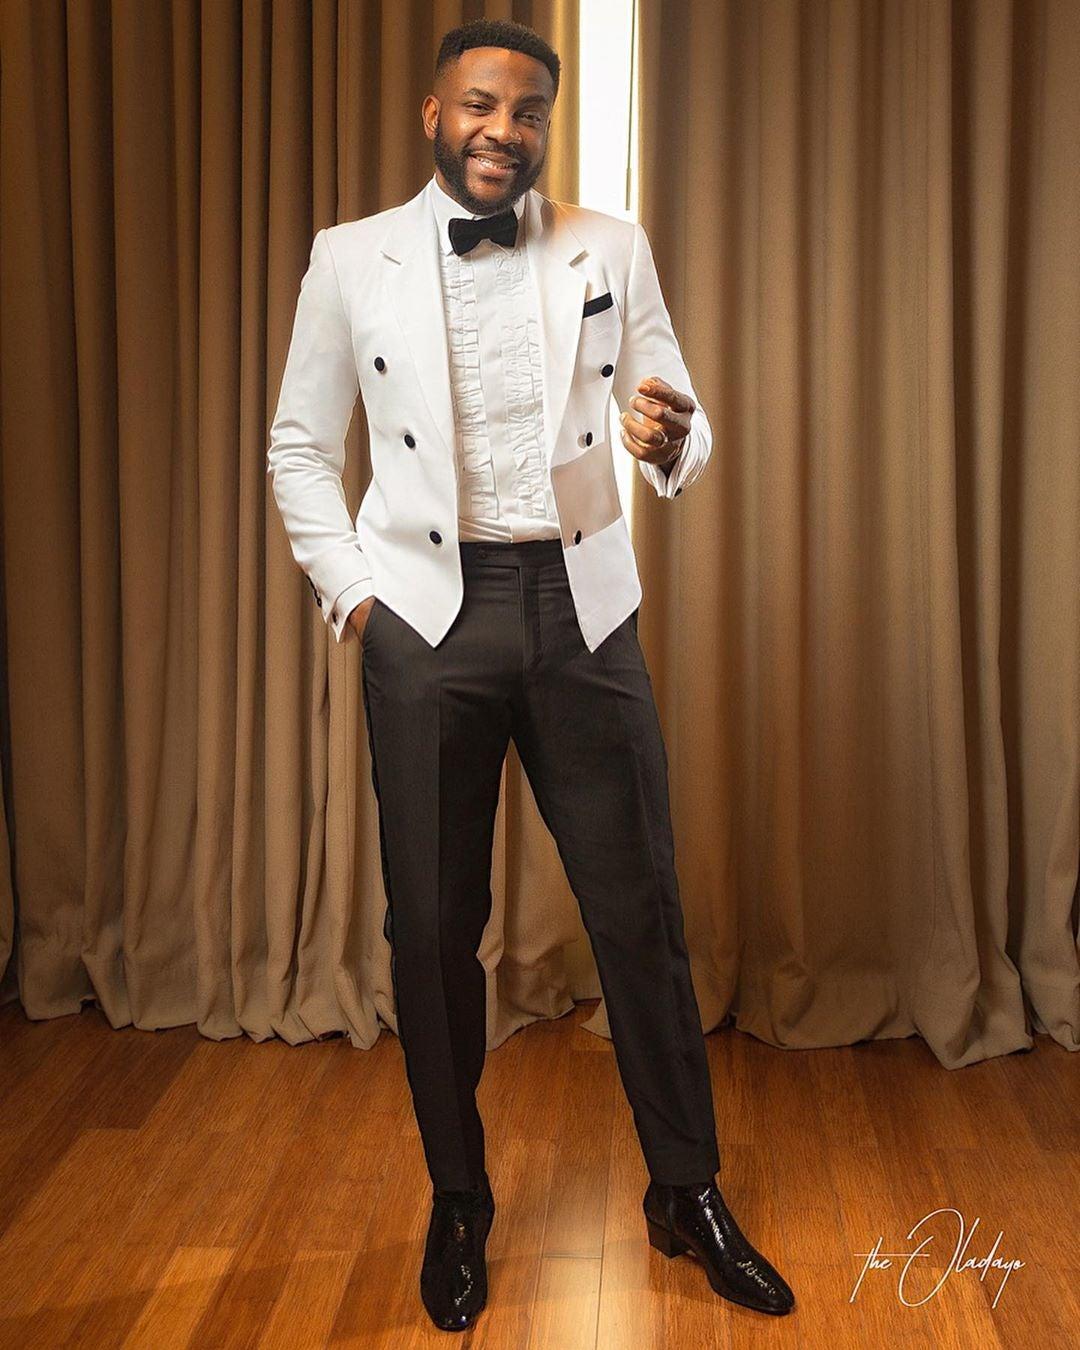 Toke Makinwa, Mercy, Ebuka and more AMVCA 2020 outfit #AMVCA7 (Photos)